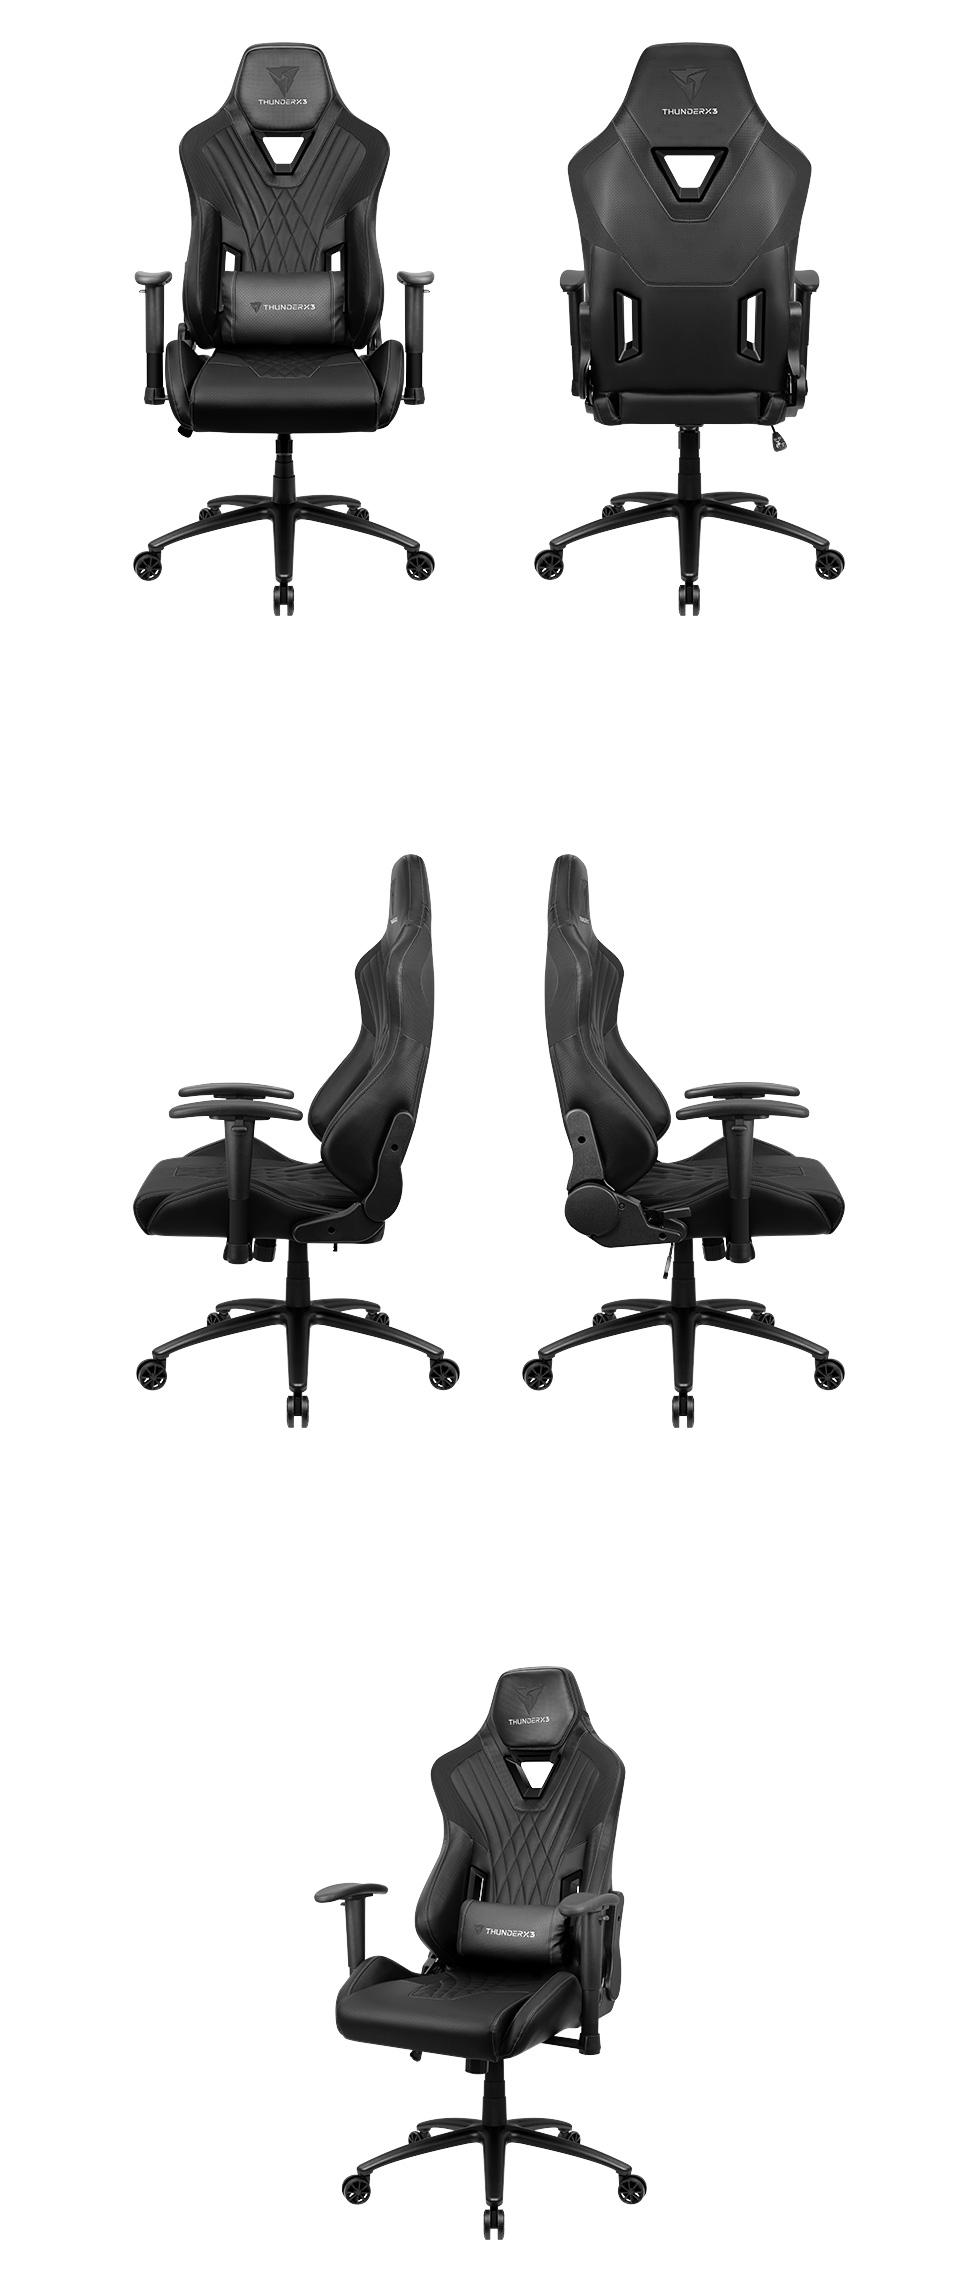 Aerocool ThunderX3 DC3 Gaming Chair Black product